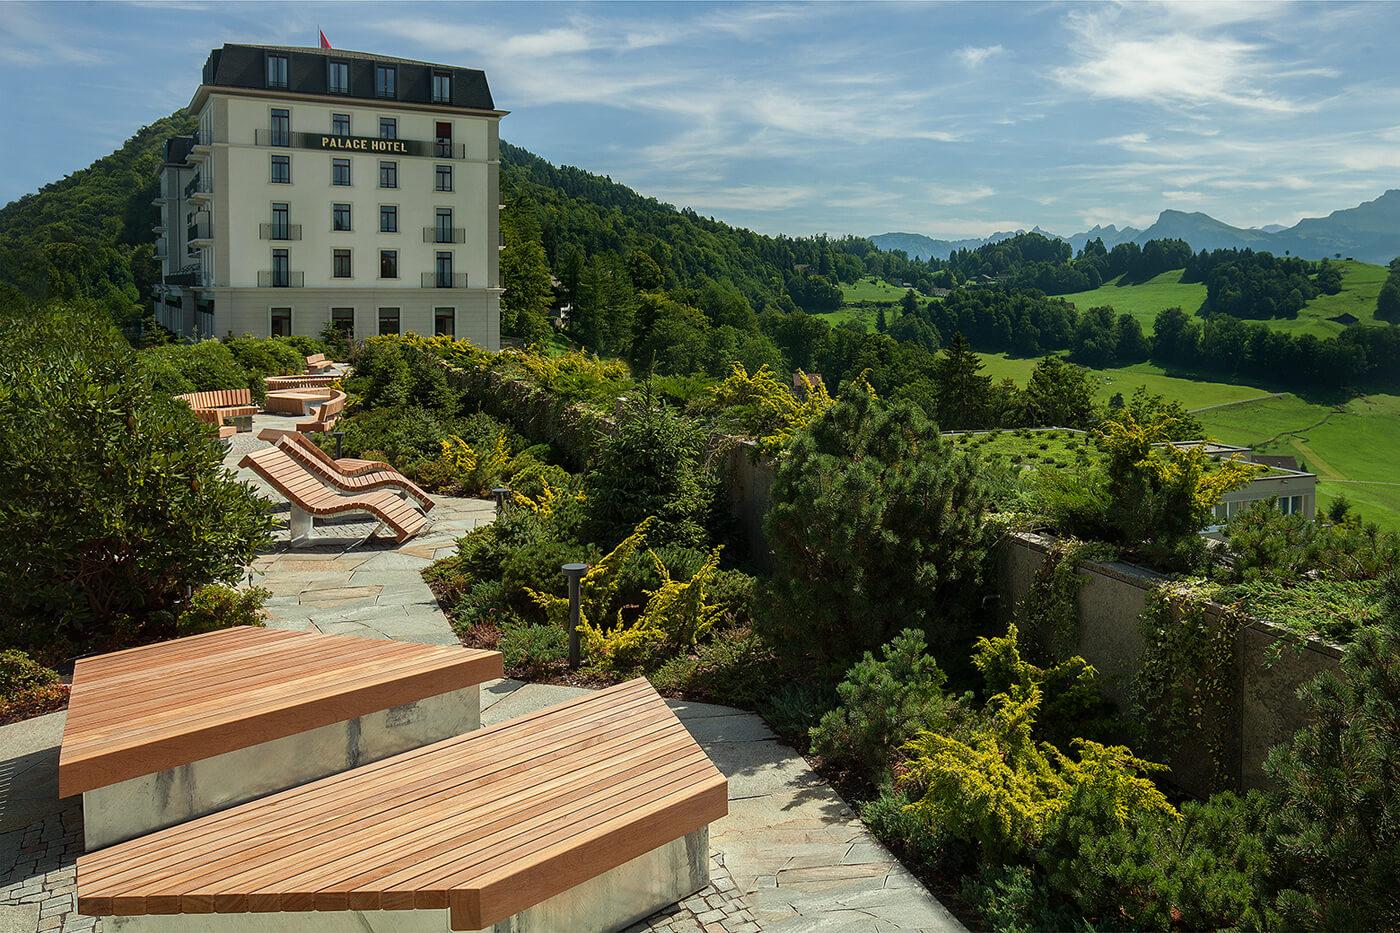 Rgenstock Hotels & Resort Partners With Revinate Hotel